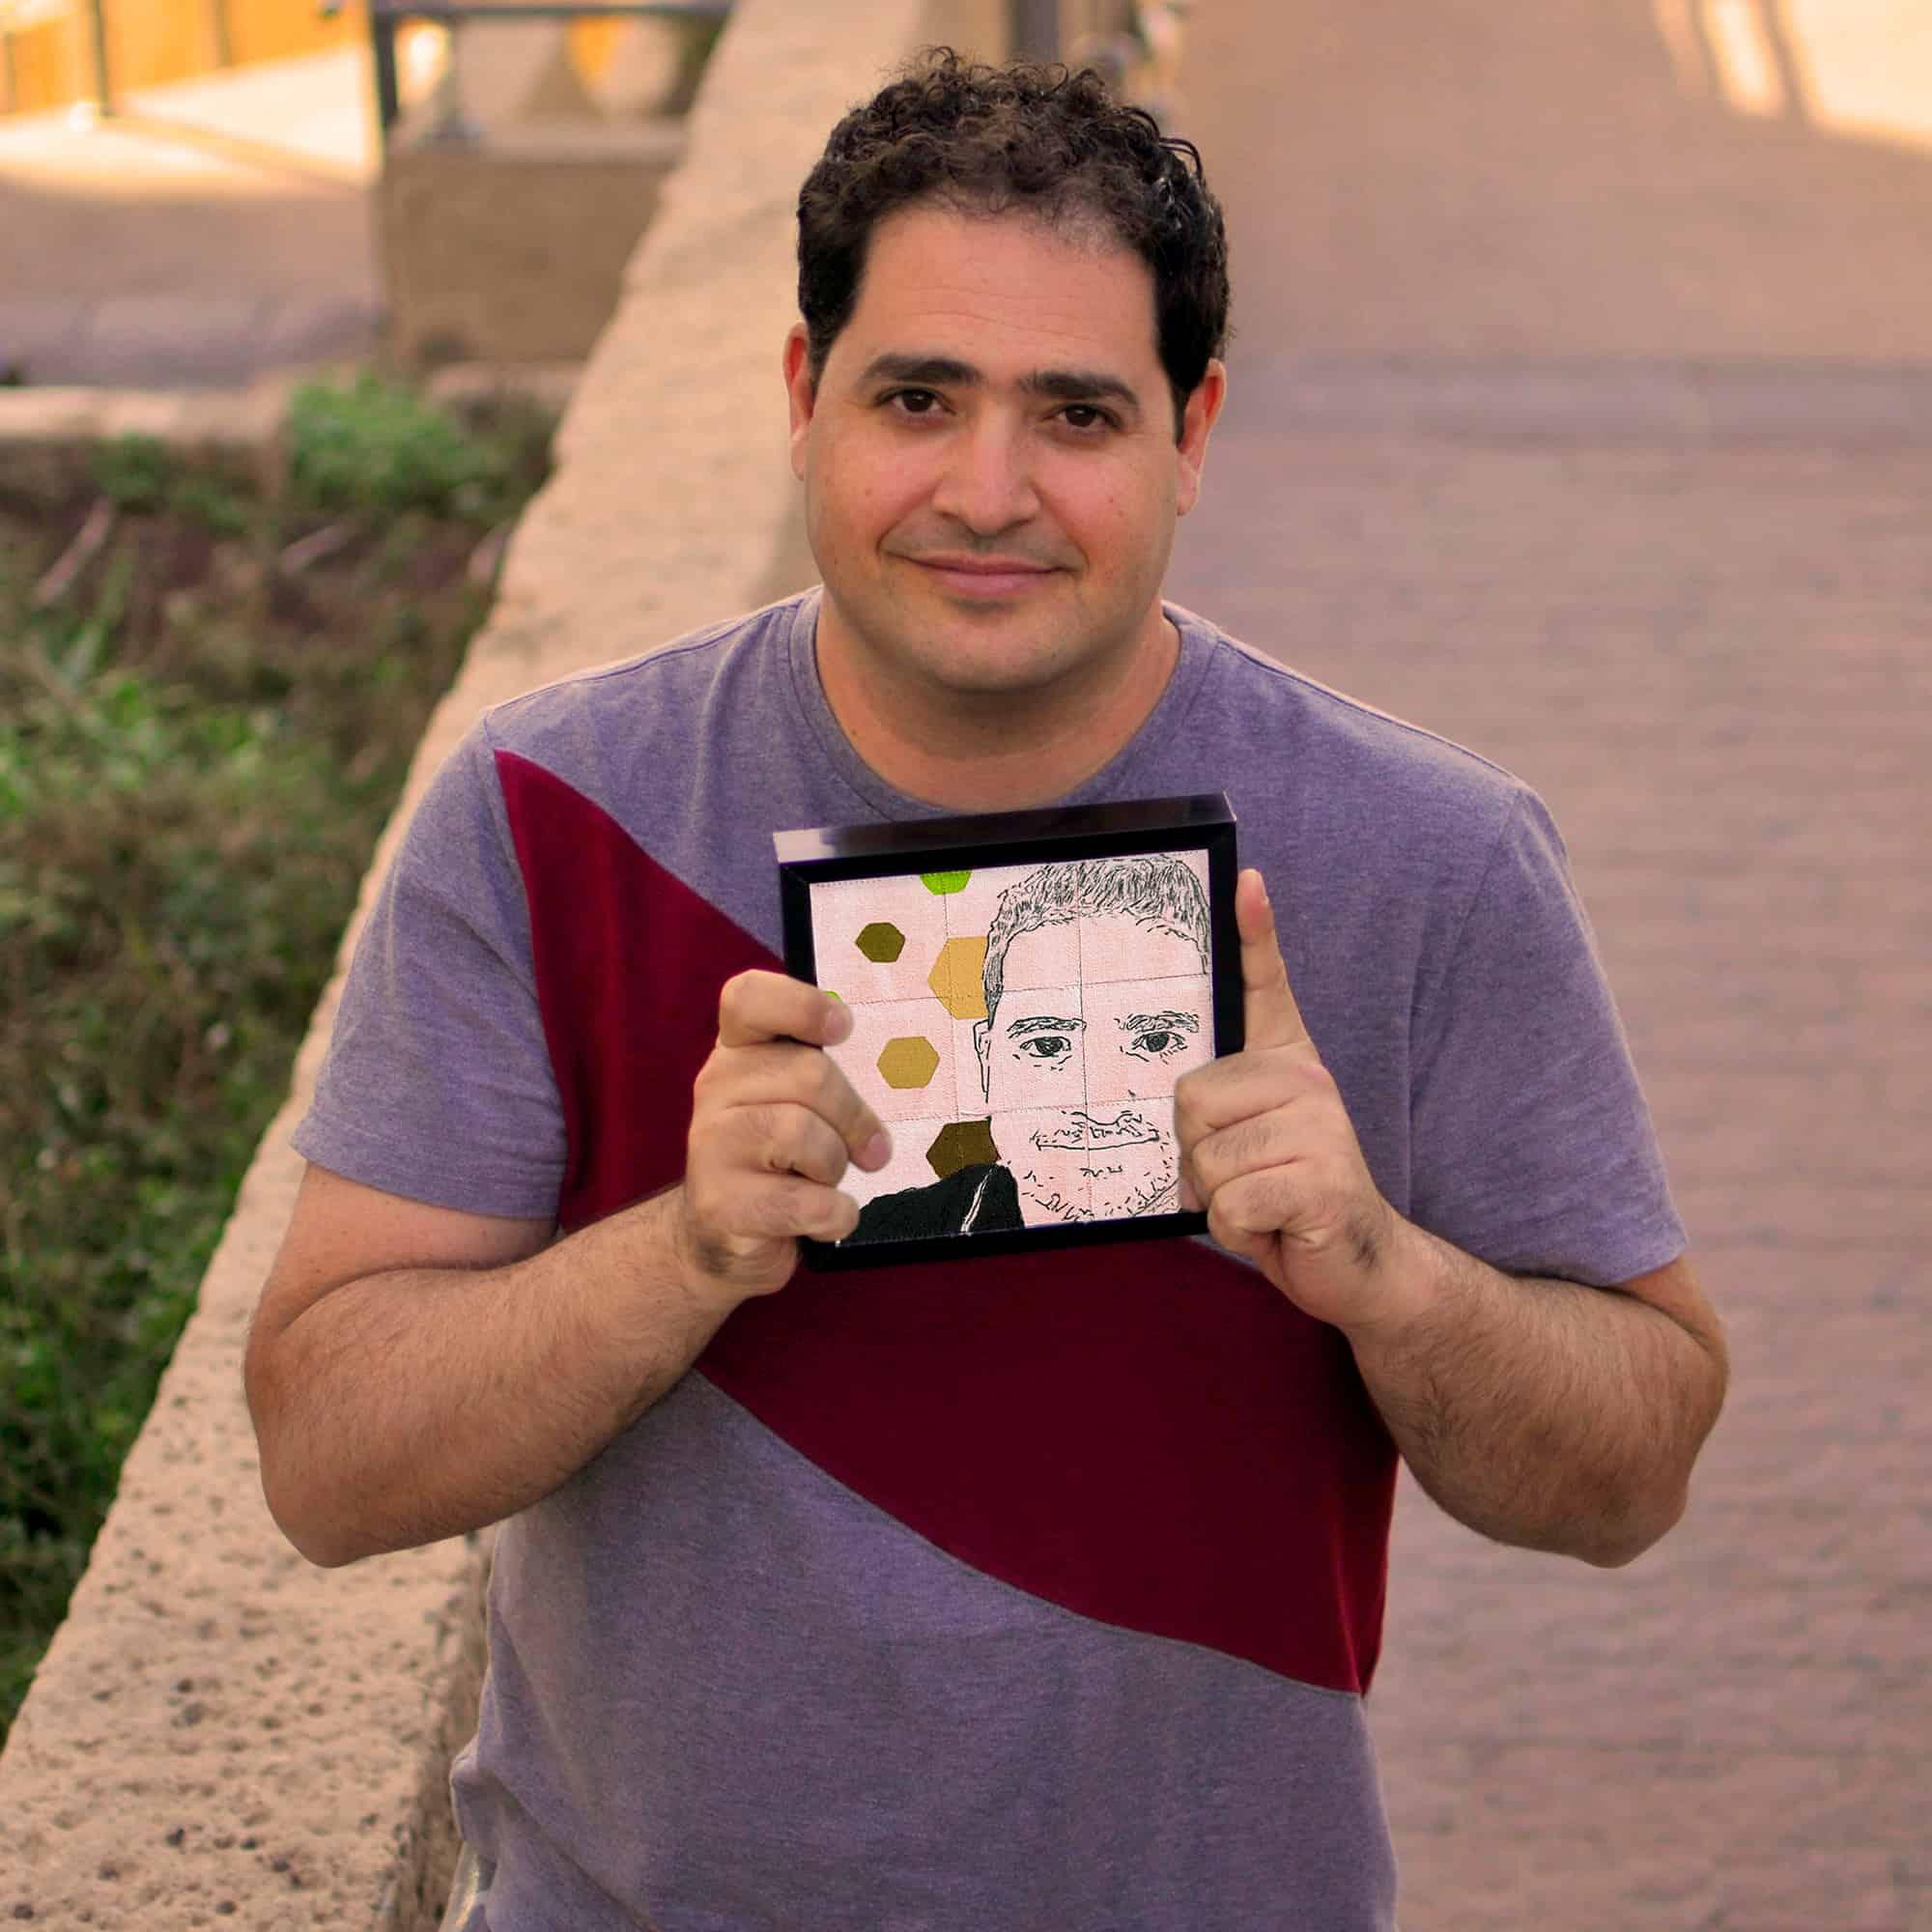 Yuval Weizman